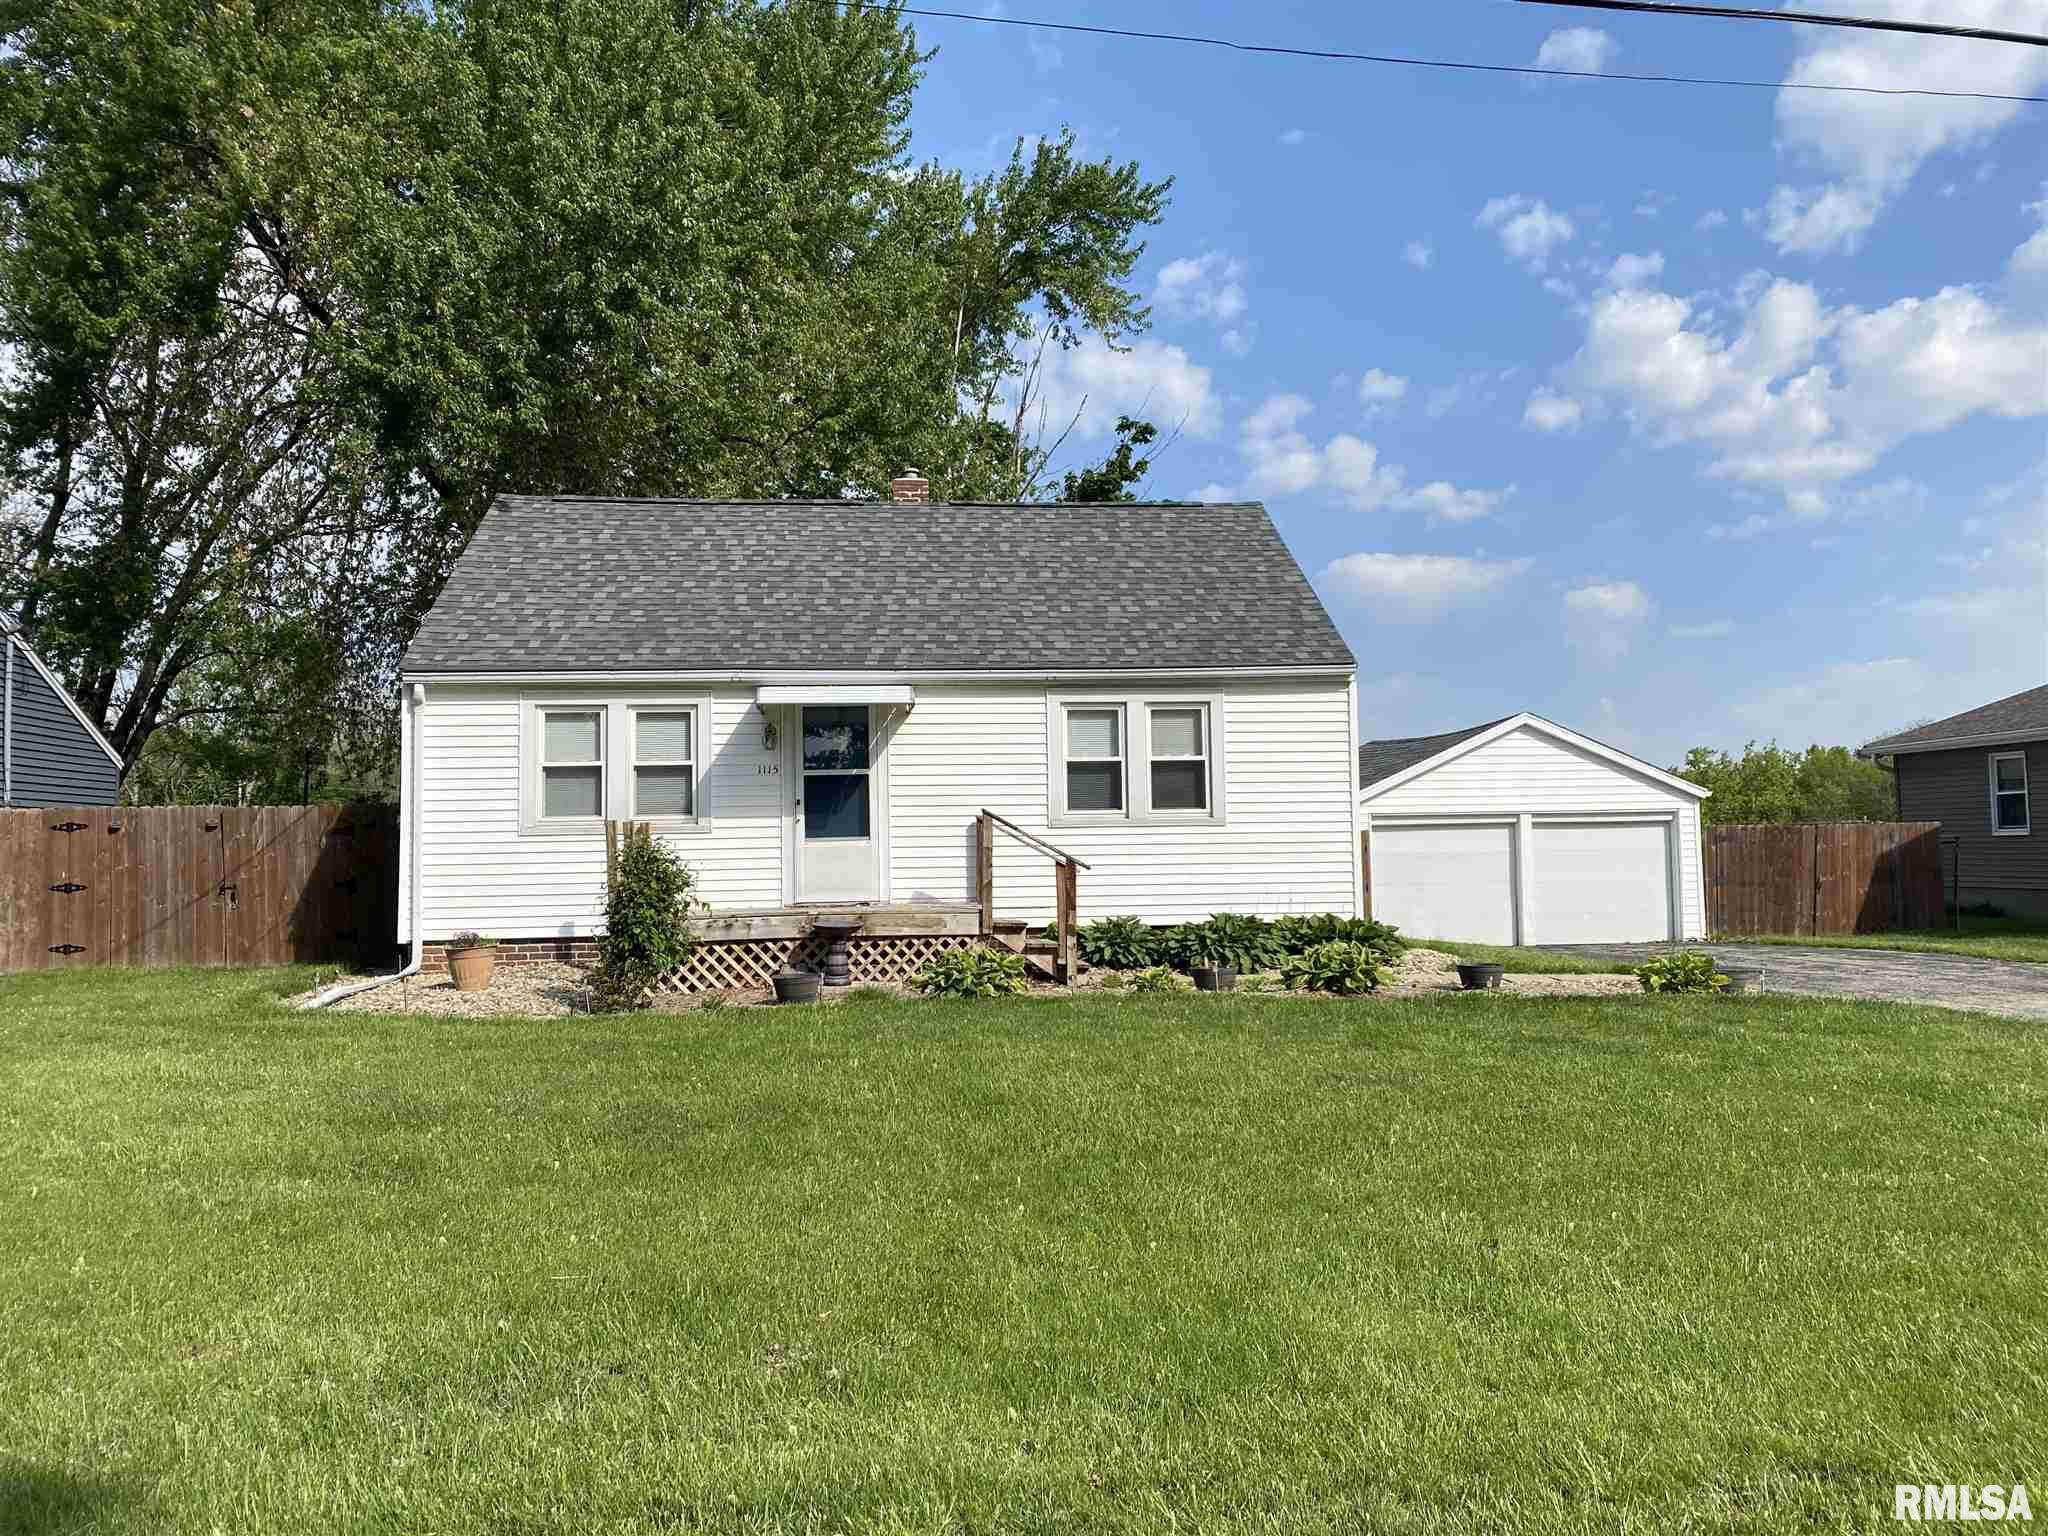 1115 S SCHMIDT Property Photo - Peoria, IL real estate listing